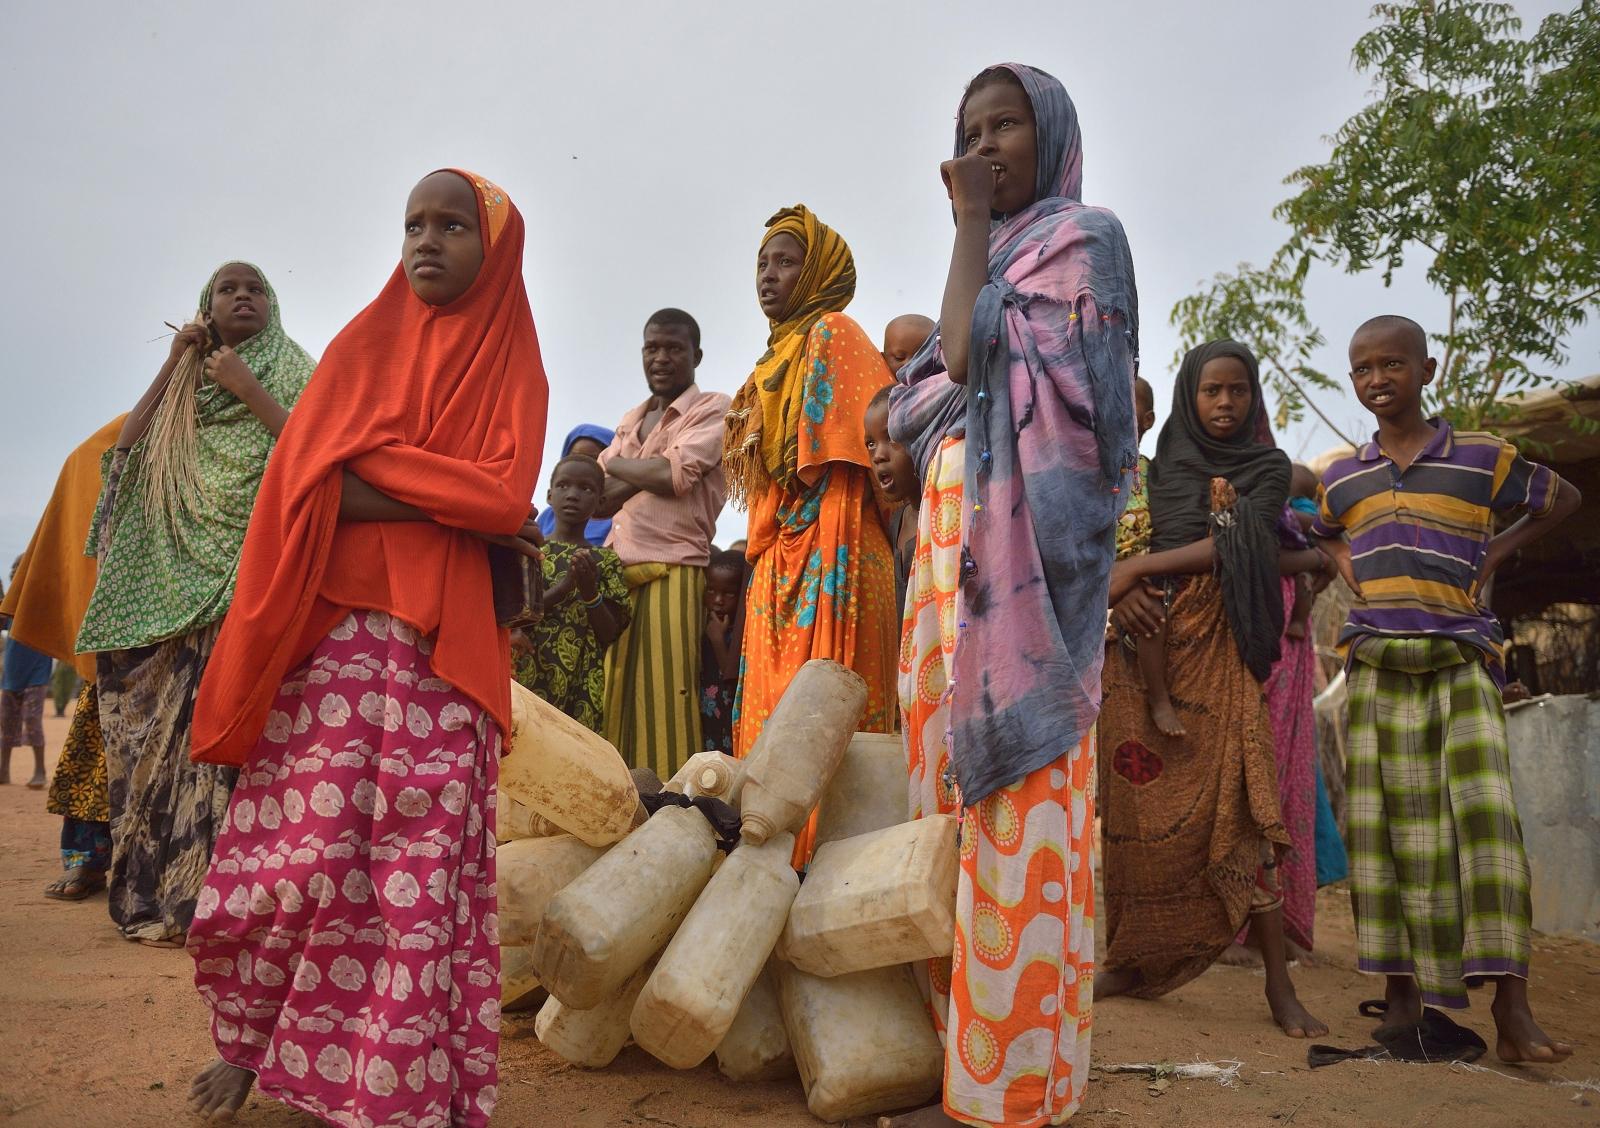 Somali refugees in Dadaab camp